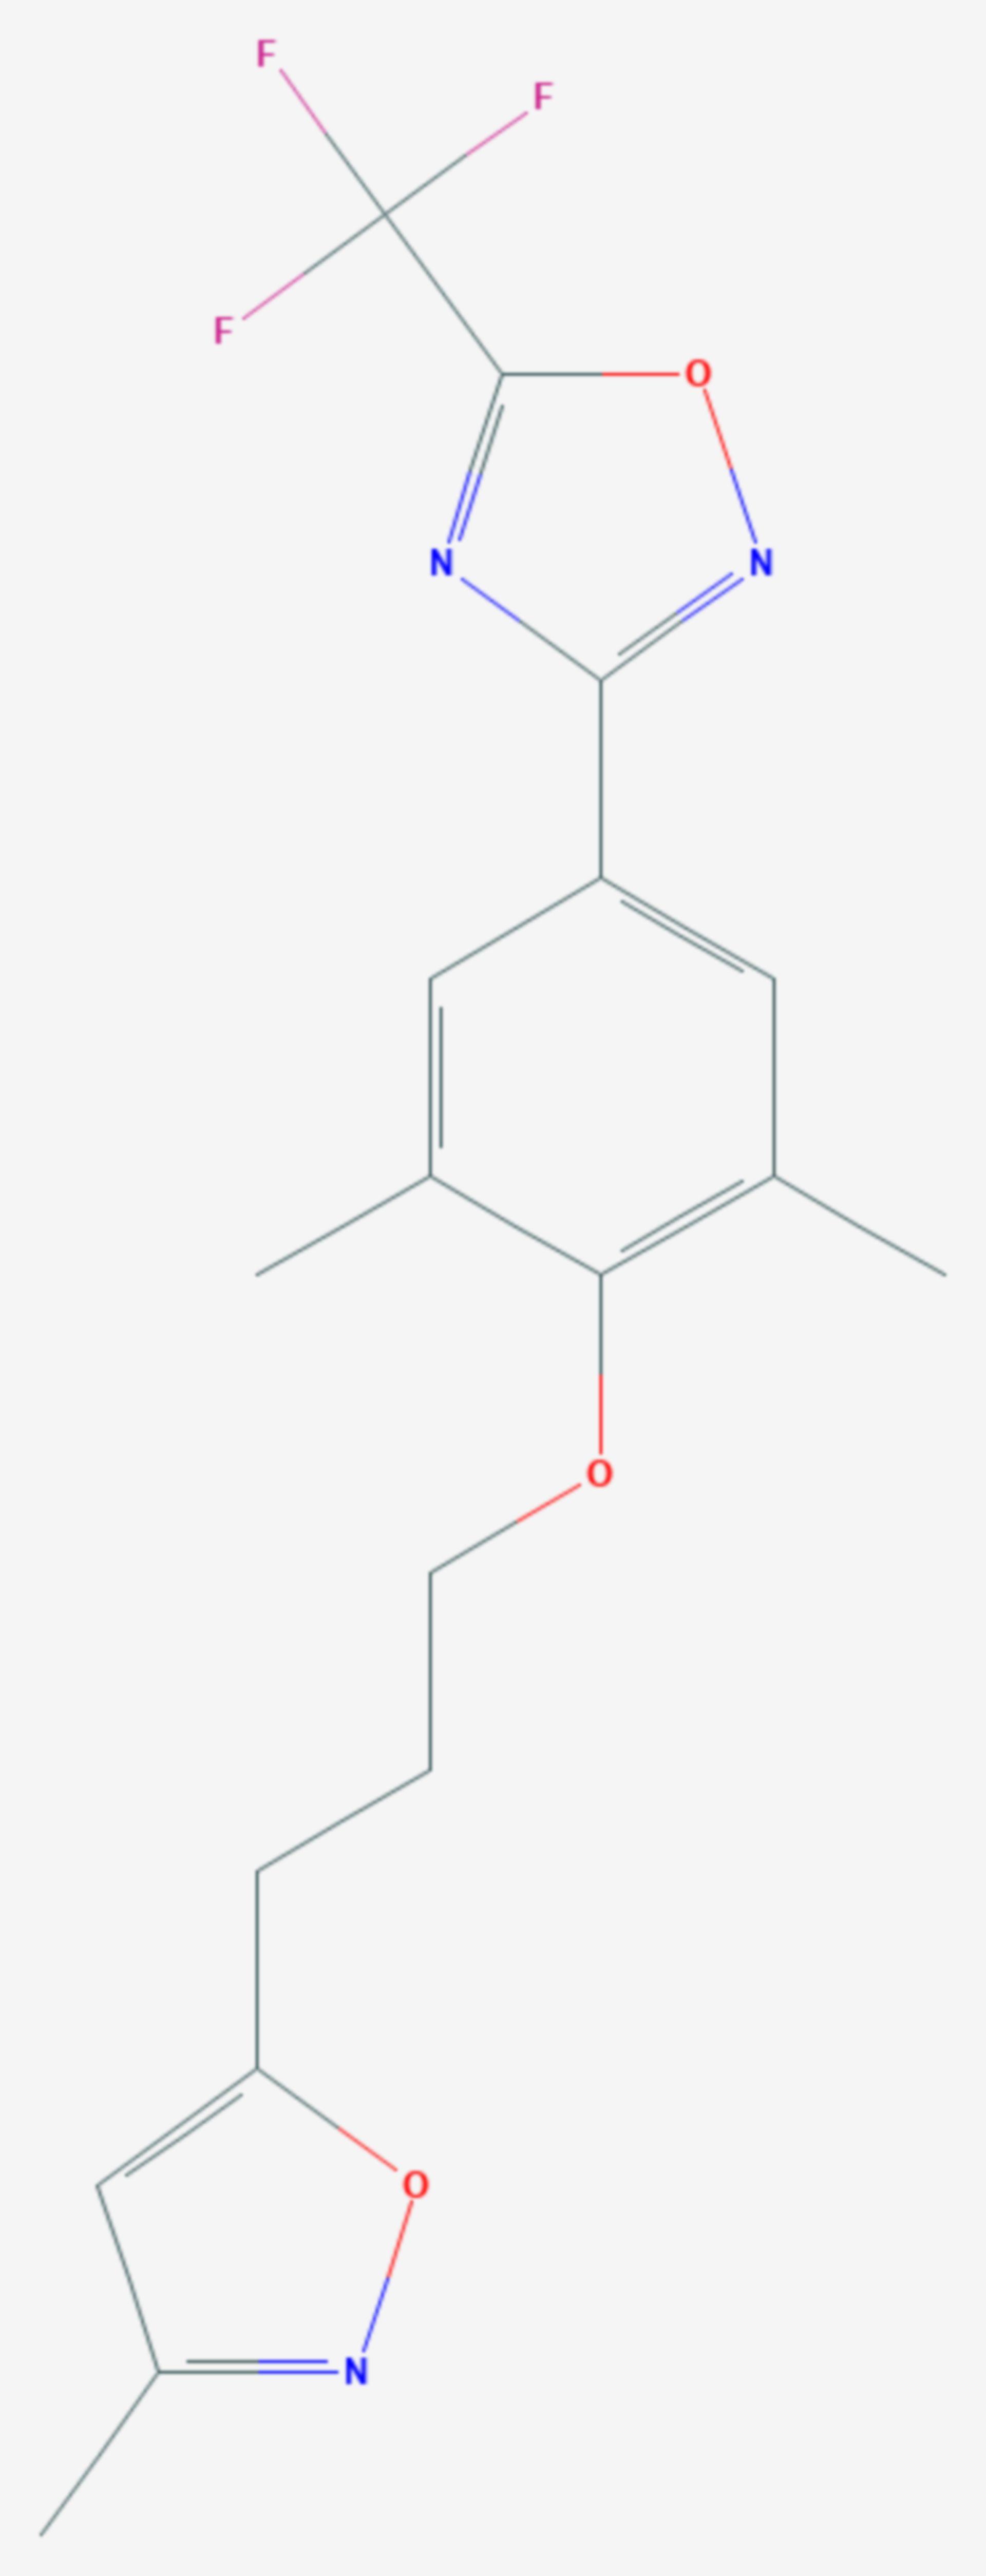 Pleconaril (Strukturformel)